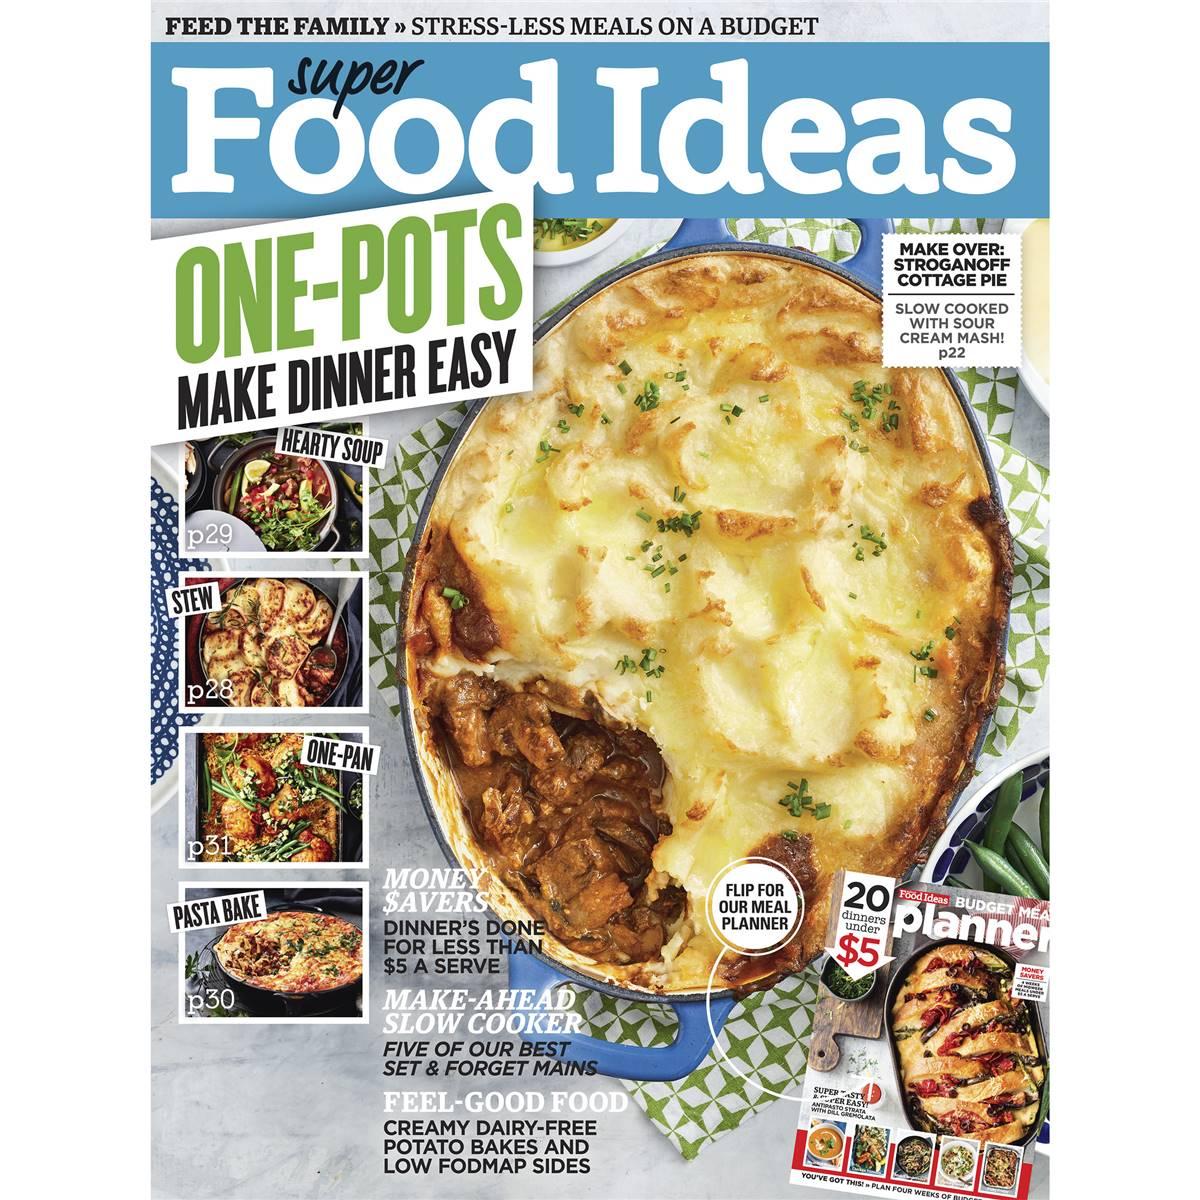 Super food ideas woolworths image gallery forumfinder Gallery